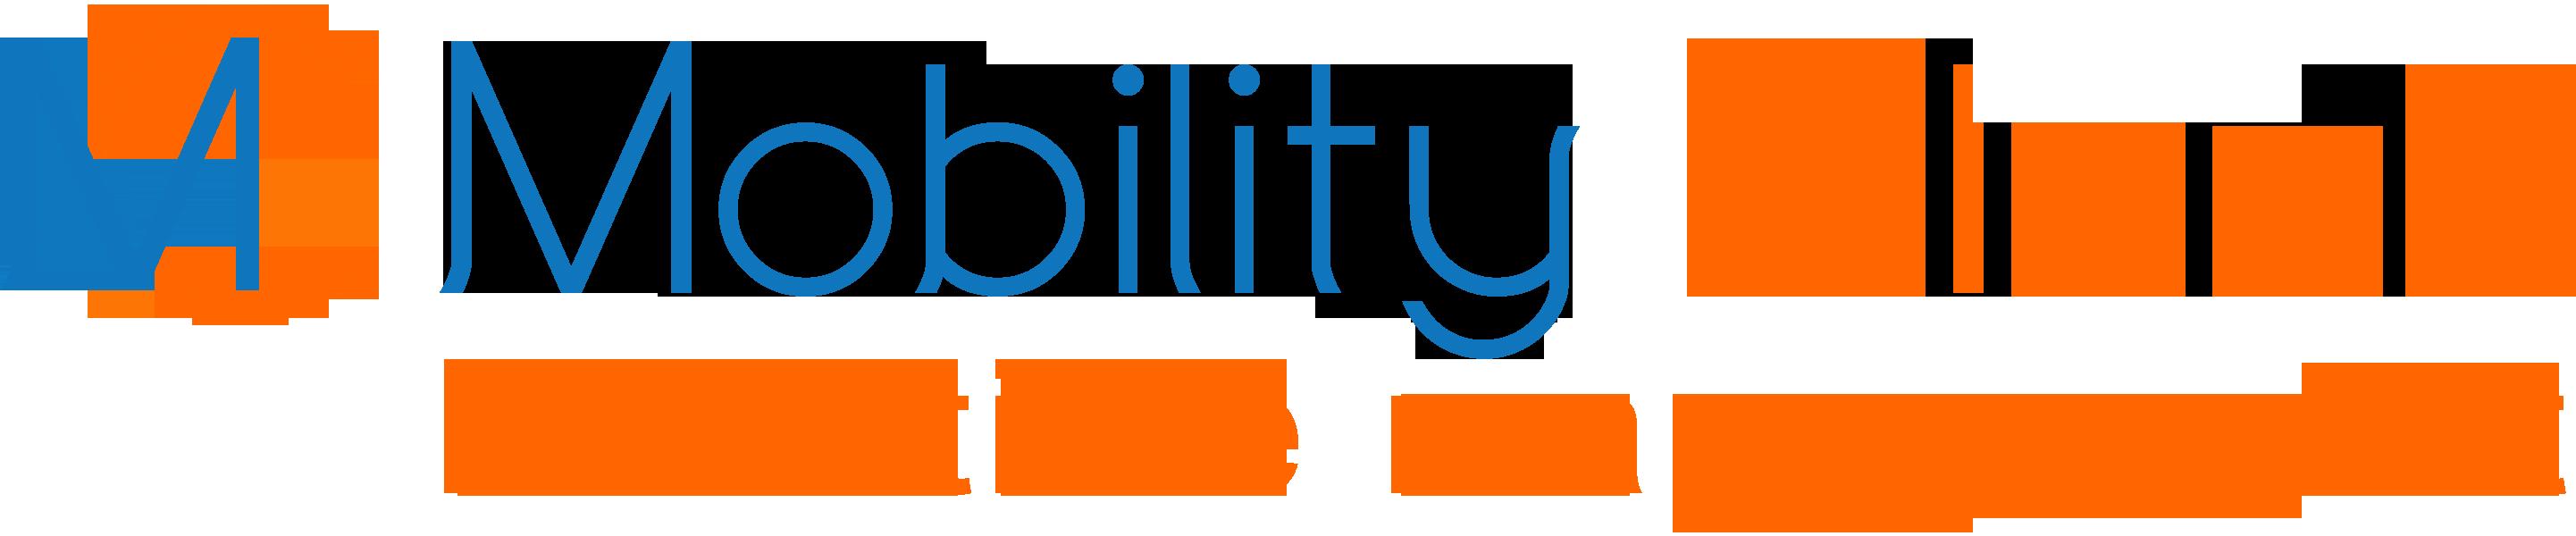 Mobility Cloud